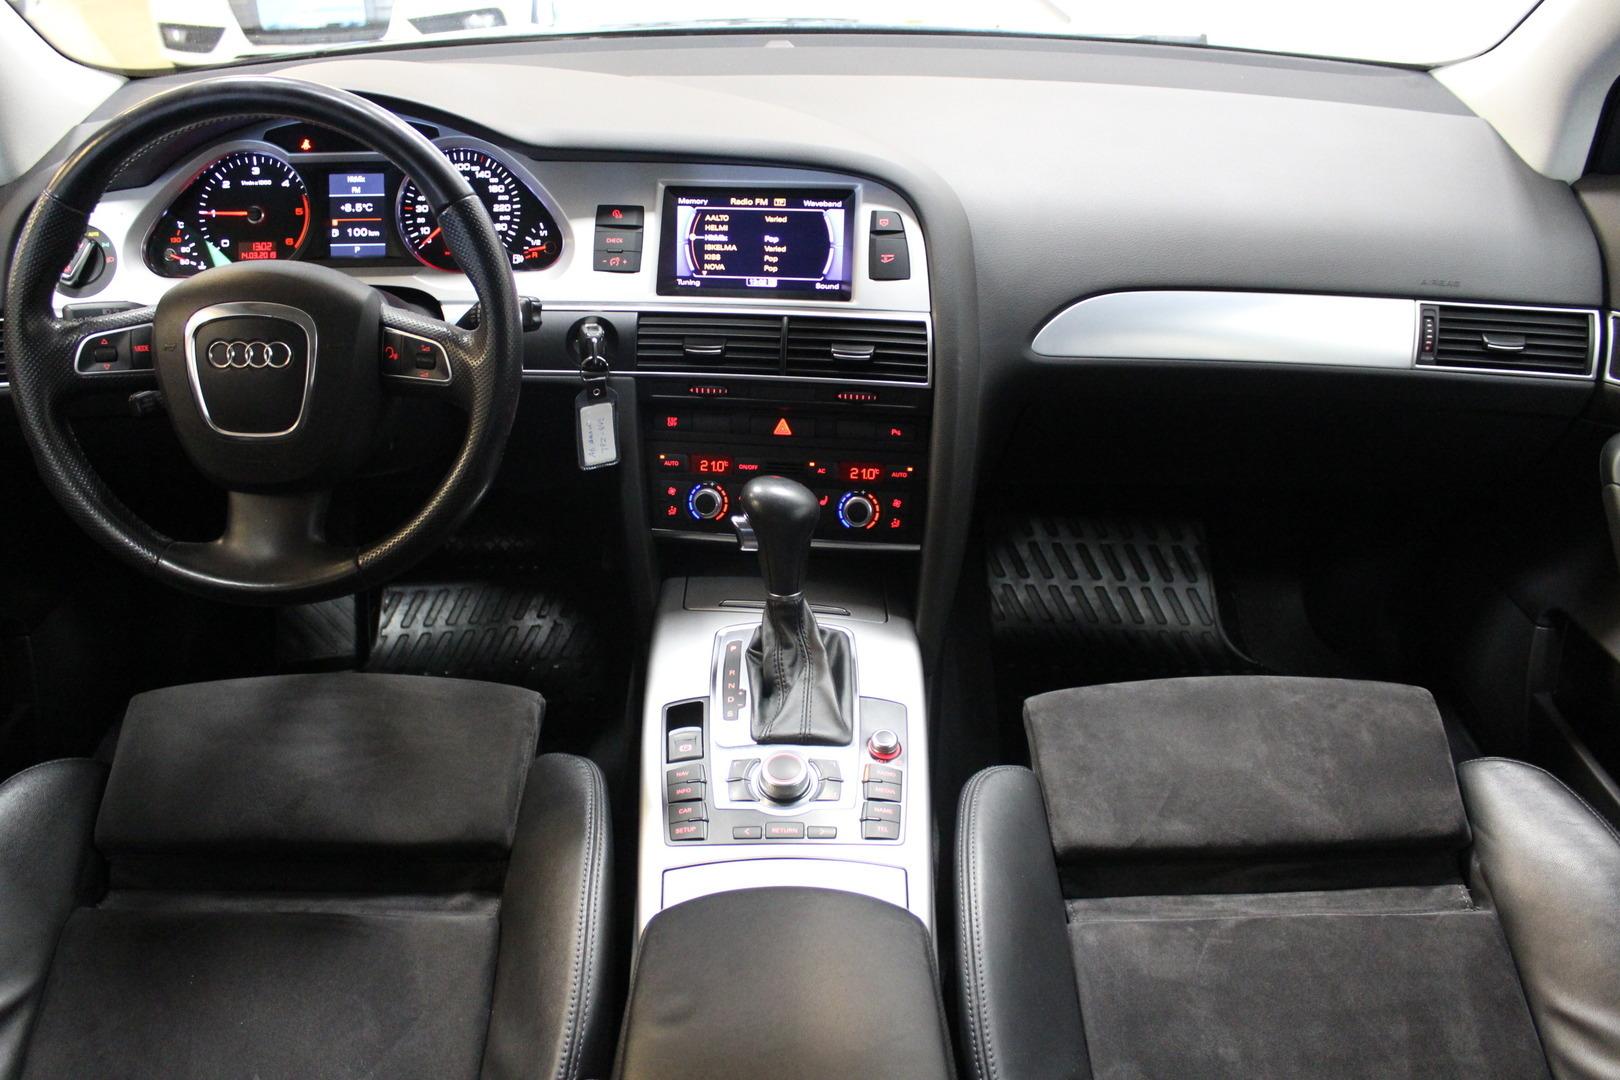 Audi A6, 2,0 TDI 125kw S-line Business Plus **Sport-istuimet #Suomi-auto #Hyvin varusteltu